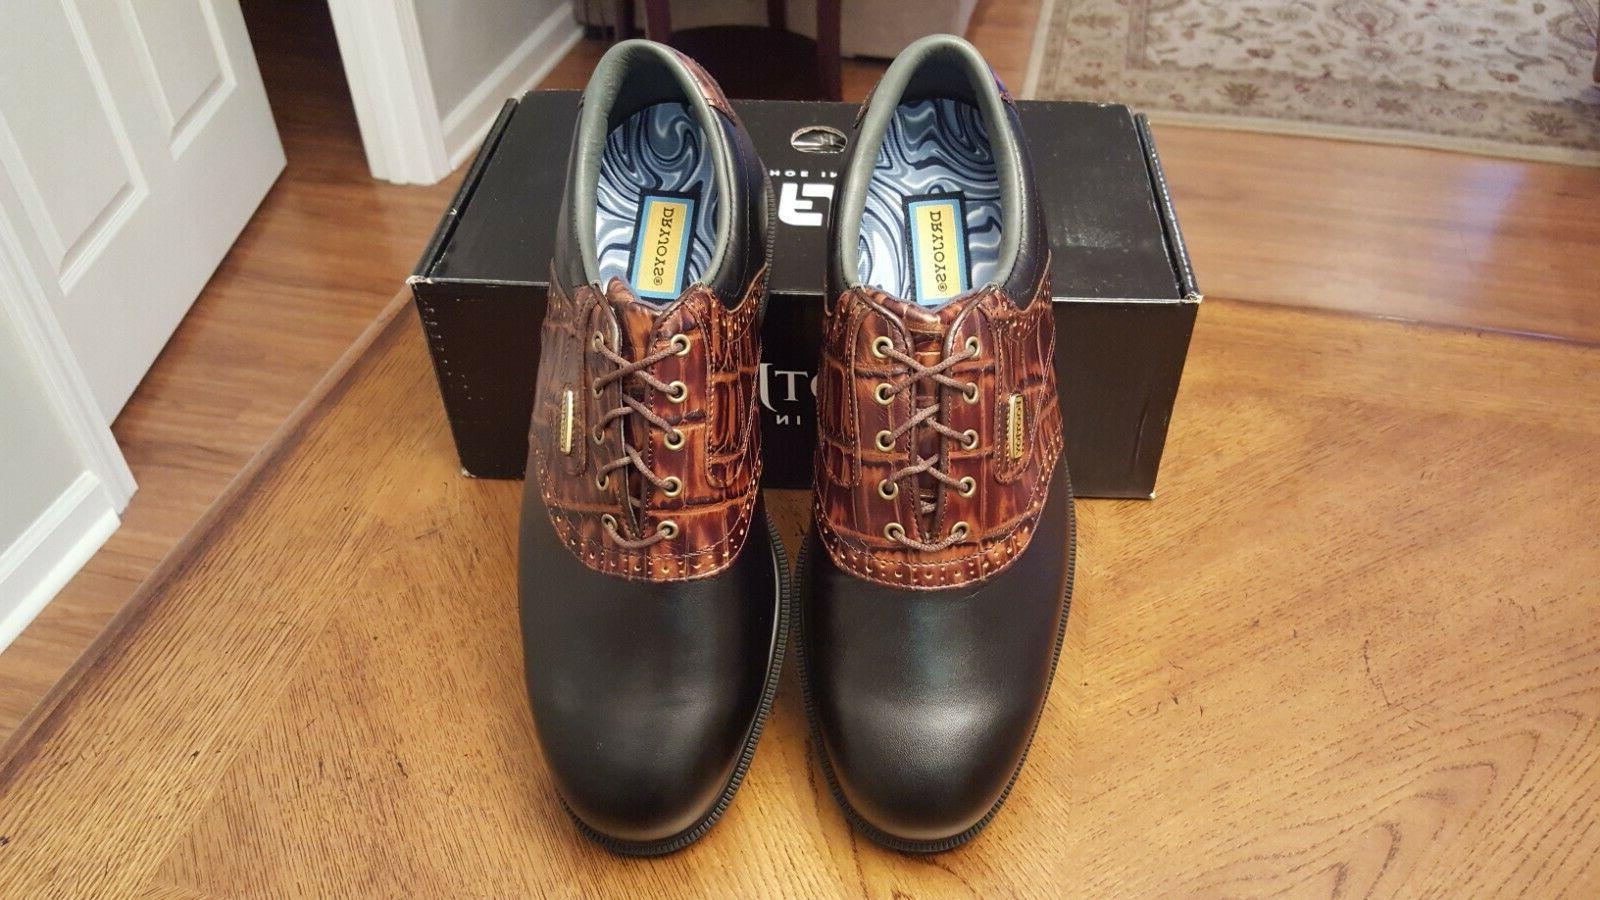 2014 Footjoy Dryjoys Golf Shoes Blk/Brn $199 RET Beautiful